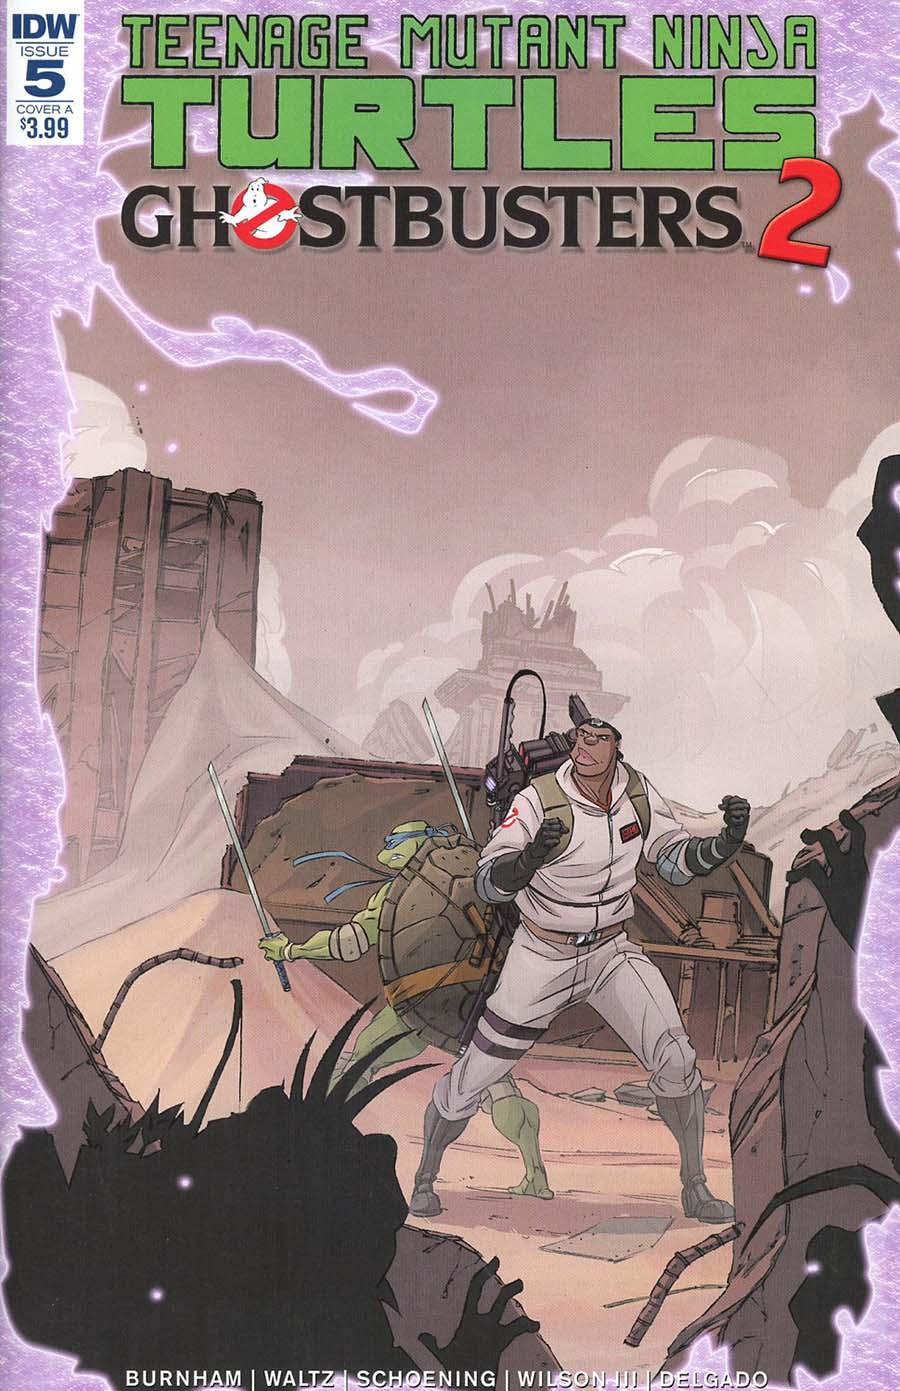 Teenage Mutant Ninja Turtles Ghostbusters II #5 Cover A Regular Dan Schoening Cover